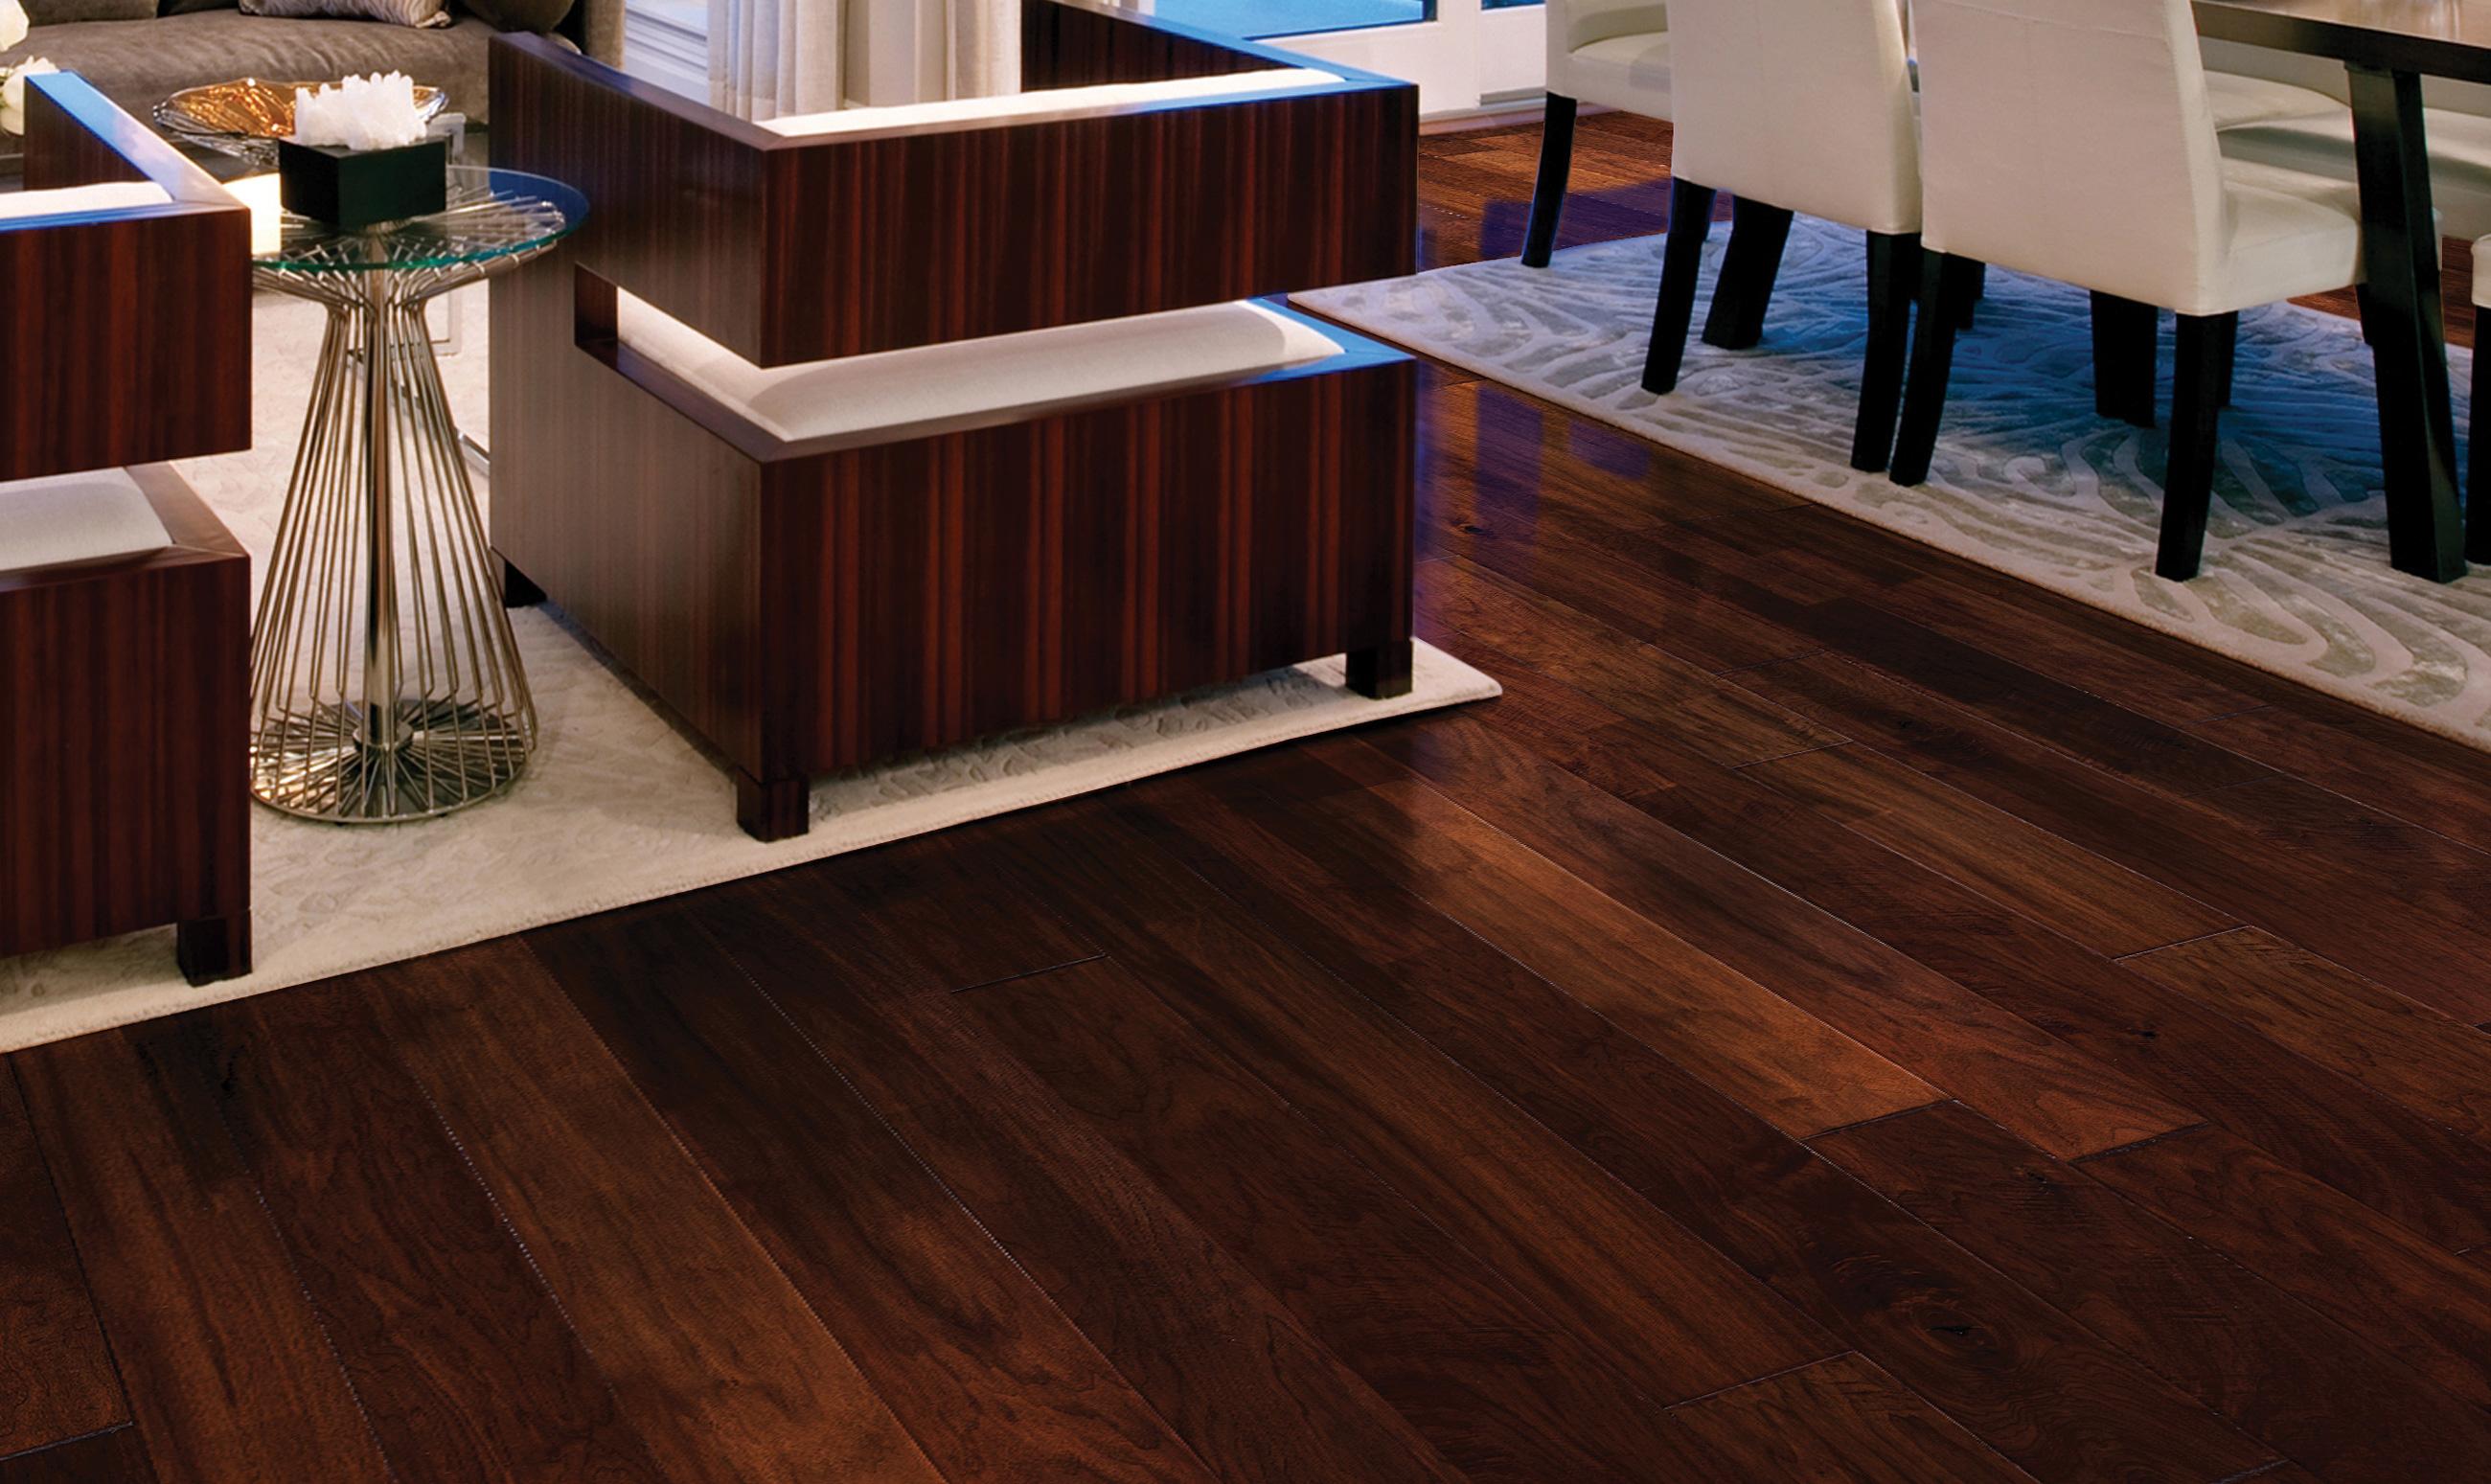 walnut floors apache dark walnut hardwood floors elegant hardwood dark walnut wooden  flooring CUROGIJ